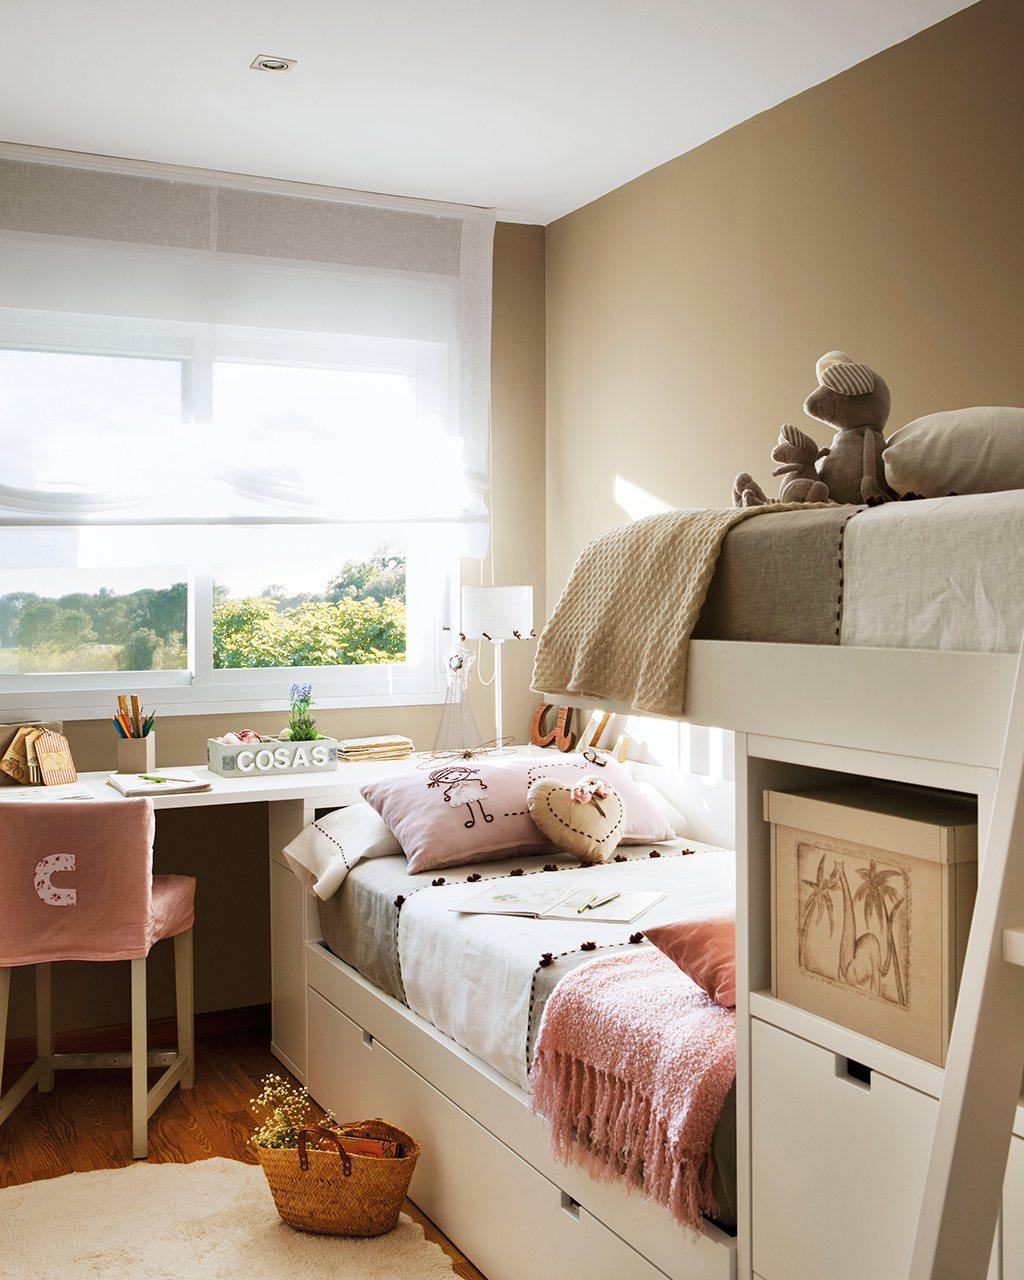 Ideas para ganar metros y ampliar visualmente pisos peque os - Dormitorios infantiles pequenos ...